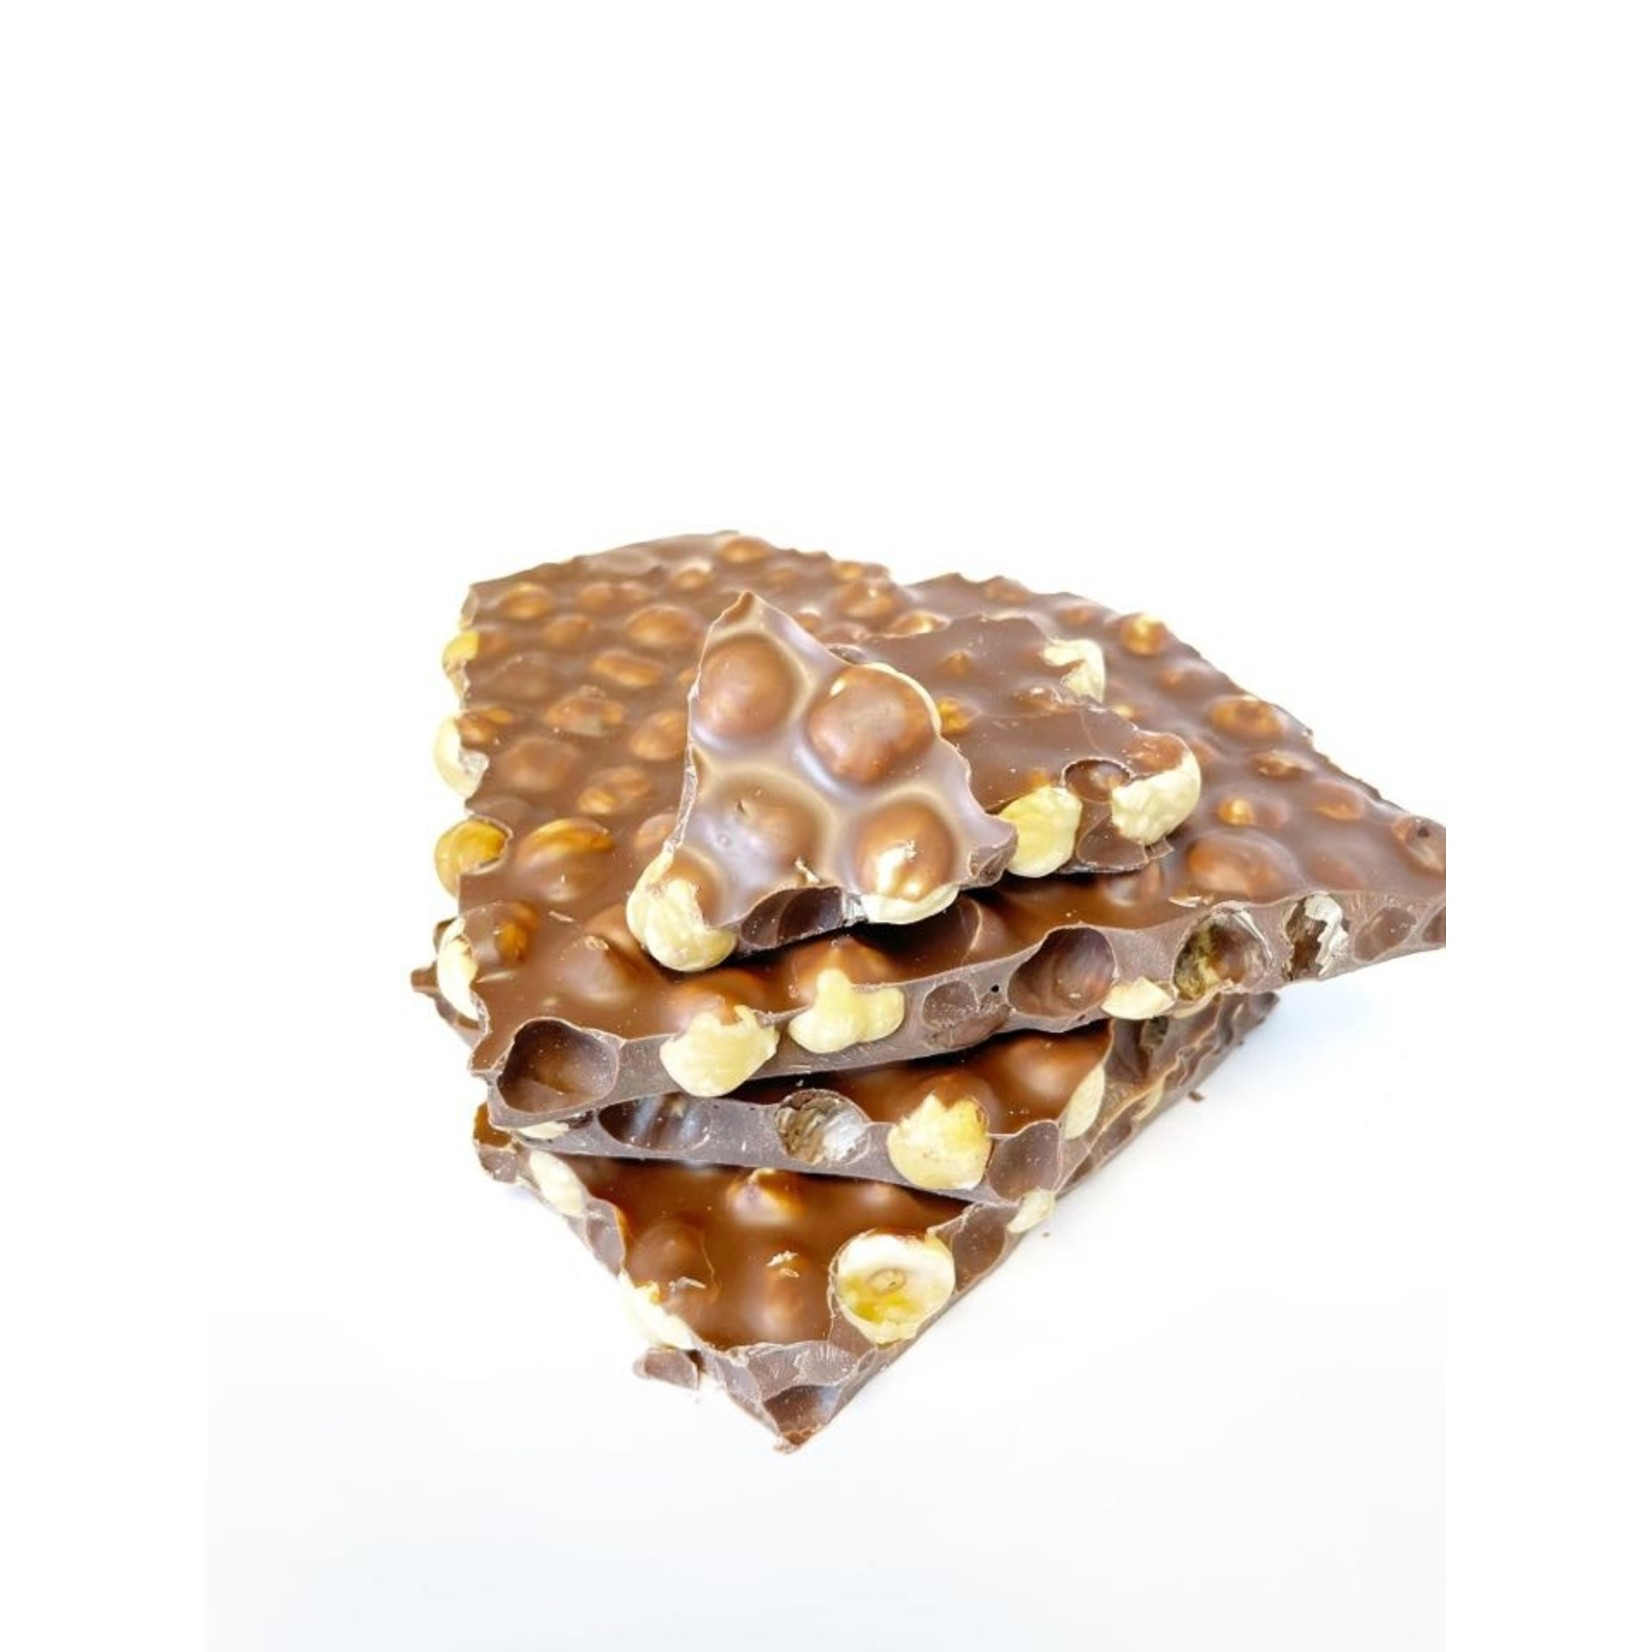 Block chocolate Hazelnut Milk 400g